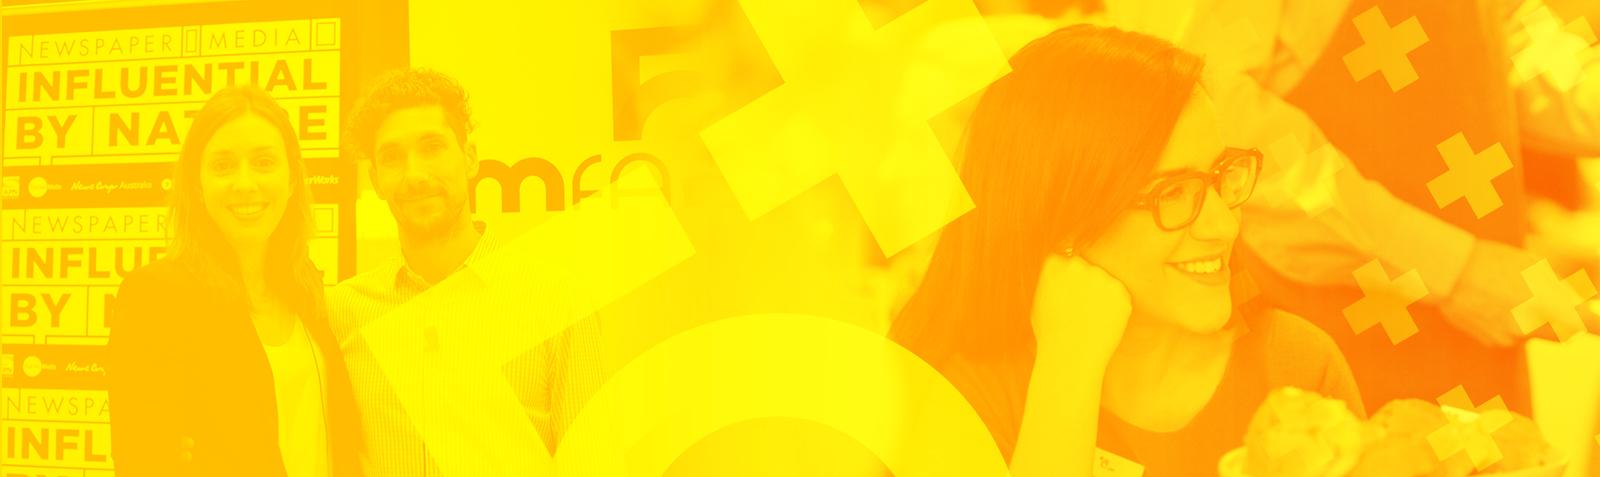 MFA_MFA5Plus_Banner3_1600x477px